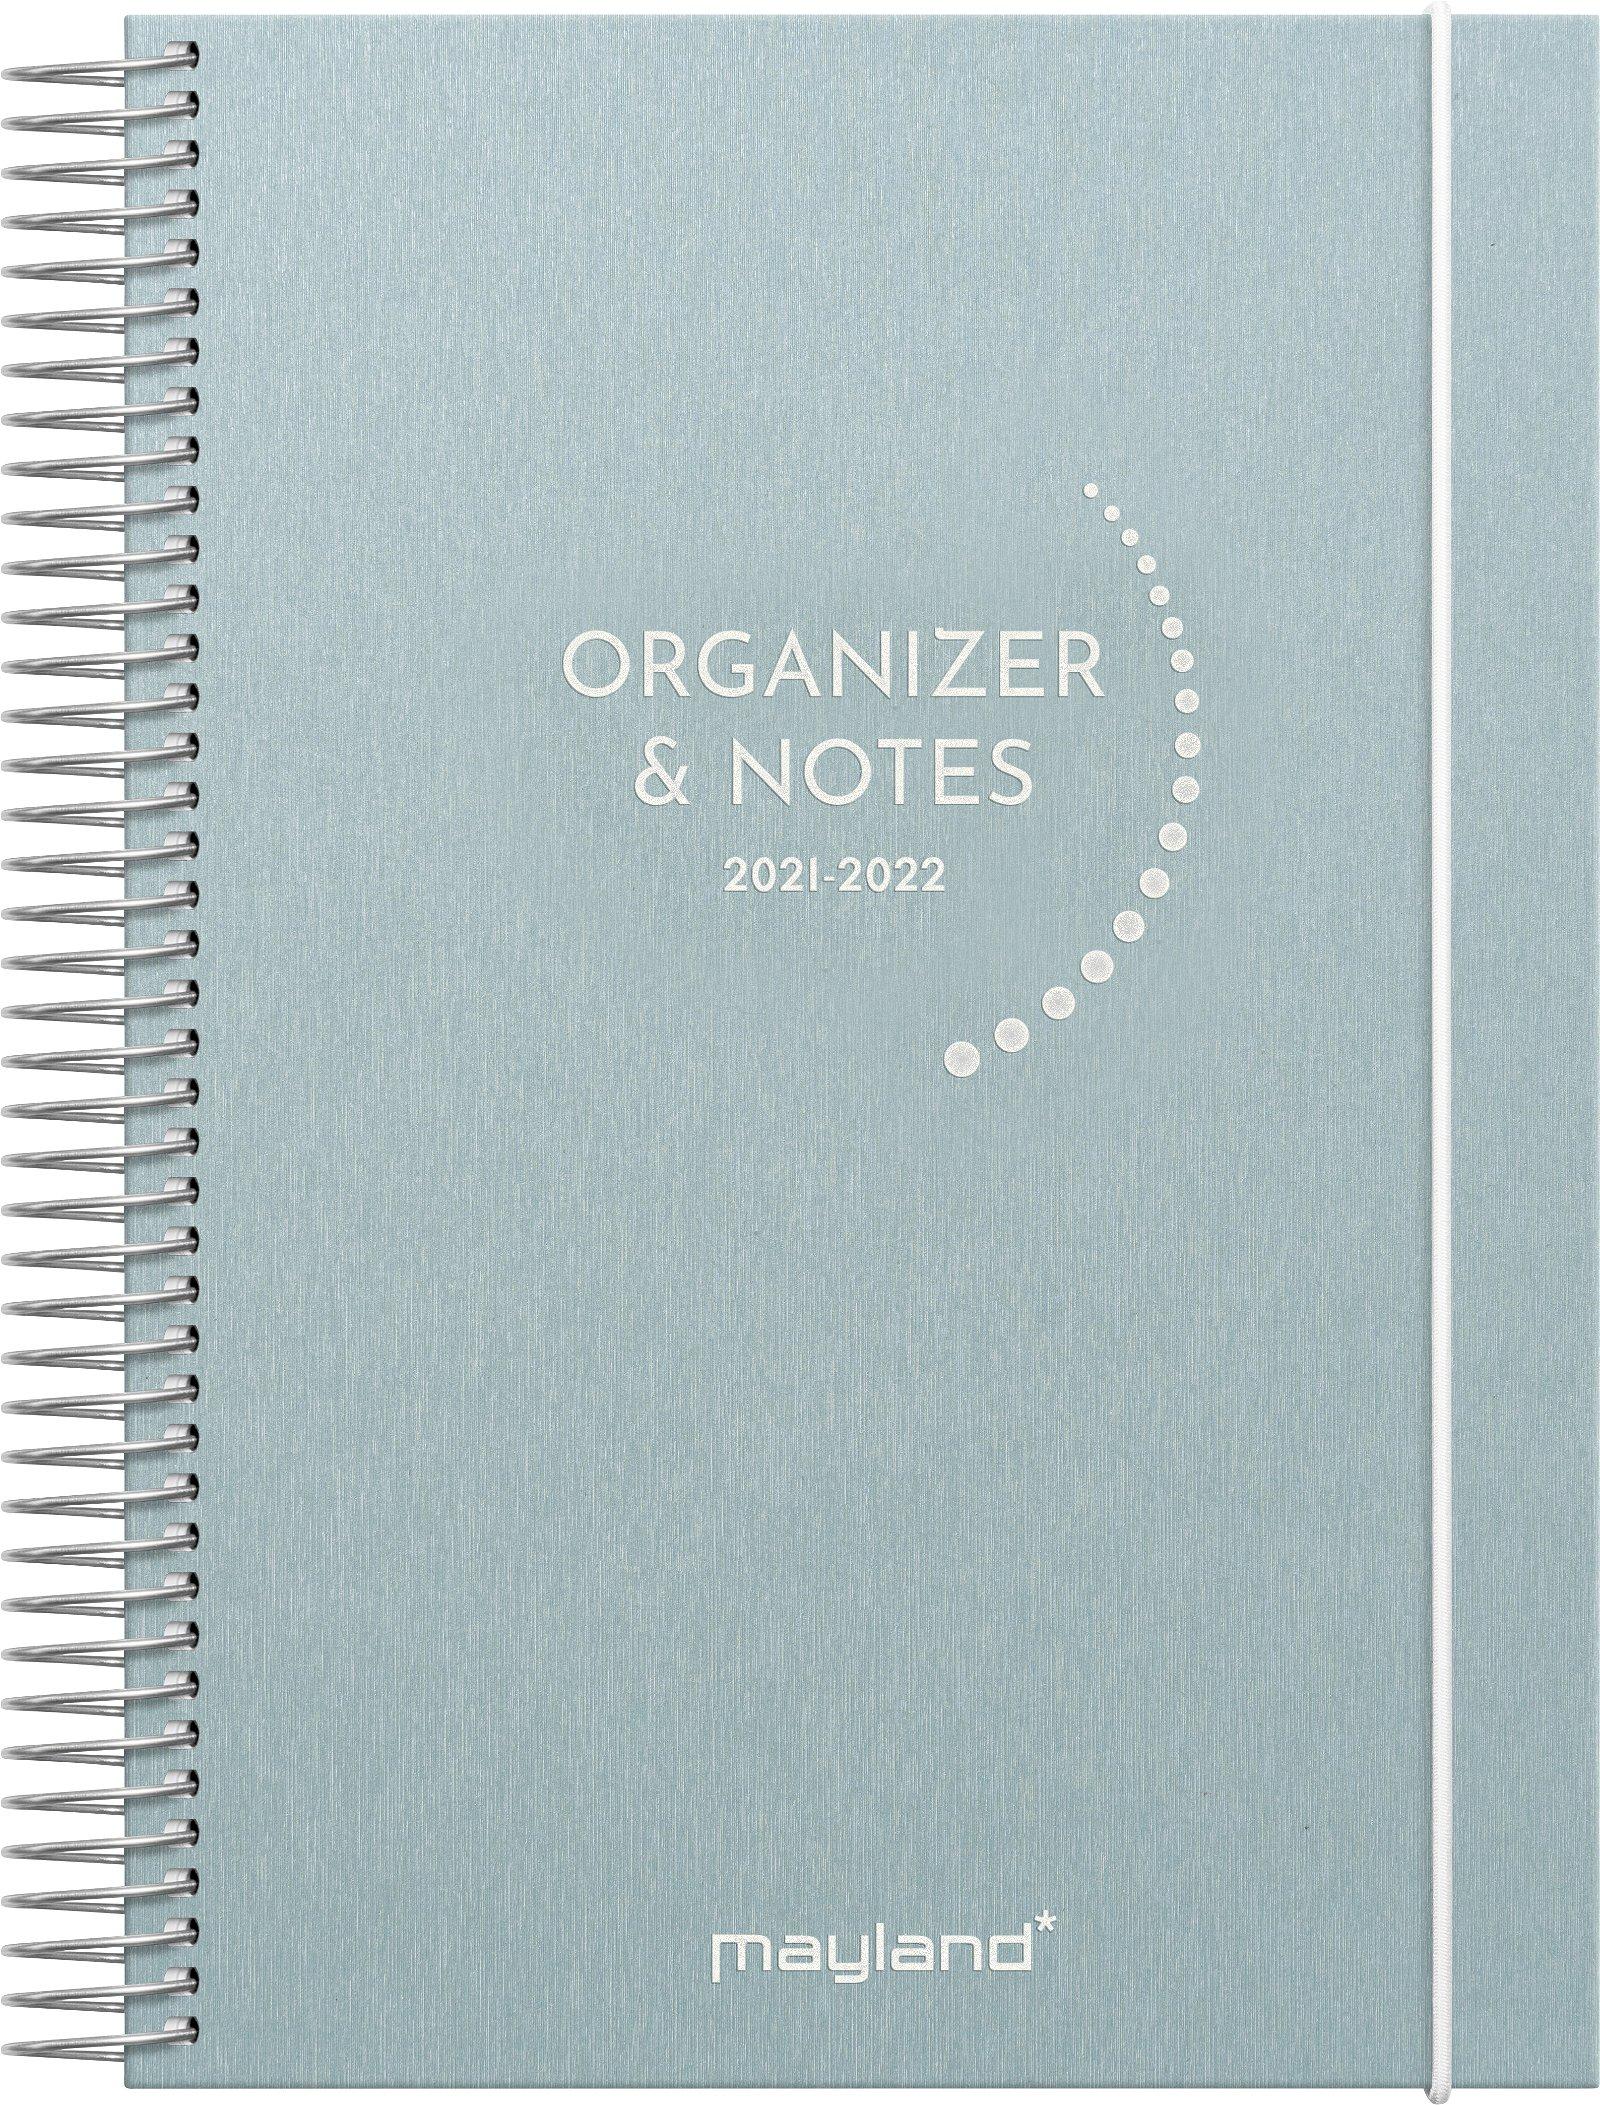 Organizer & Notes FSC Mix